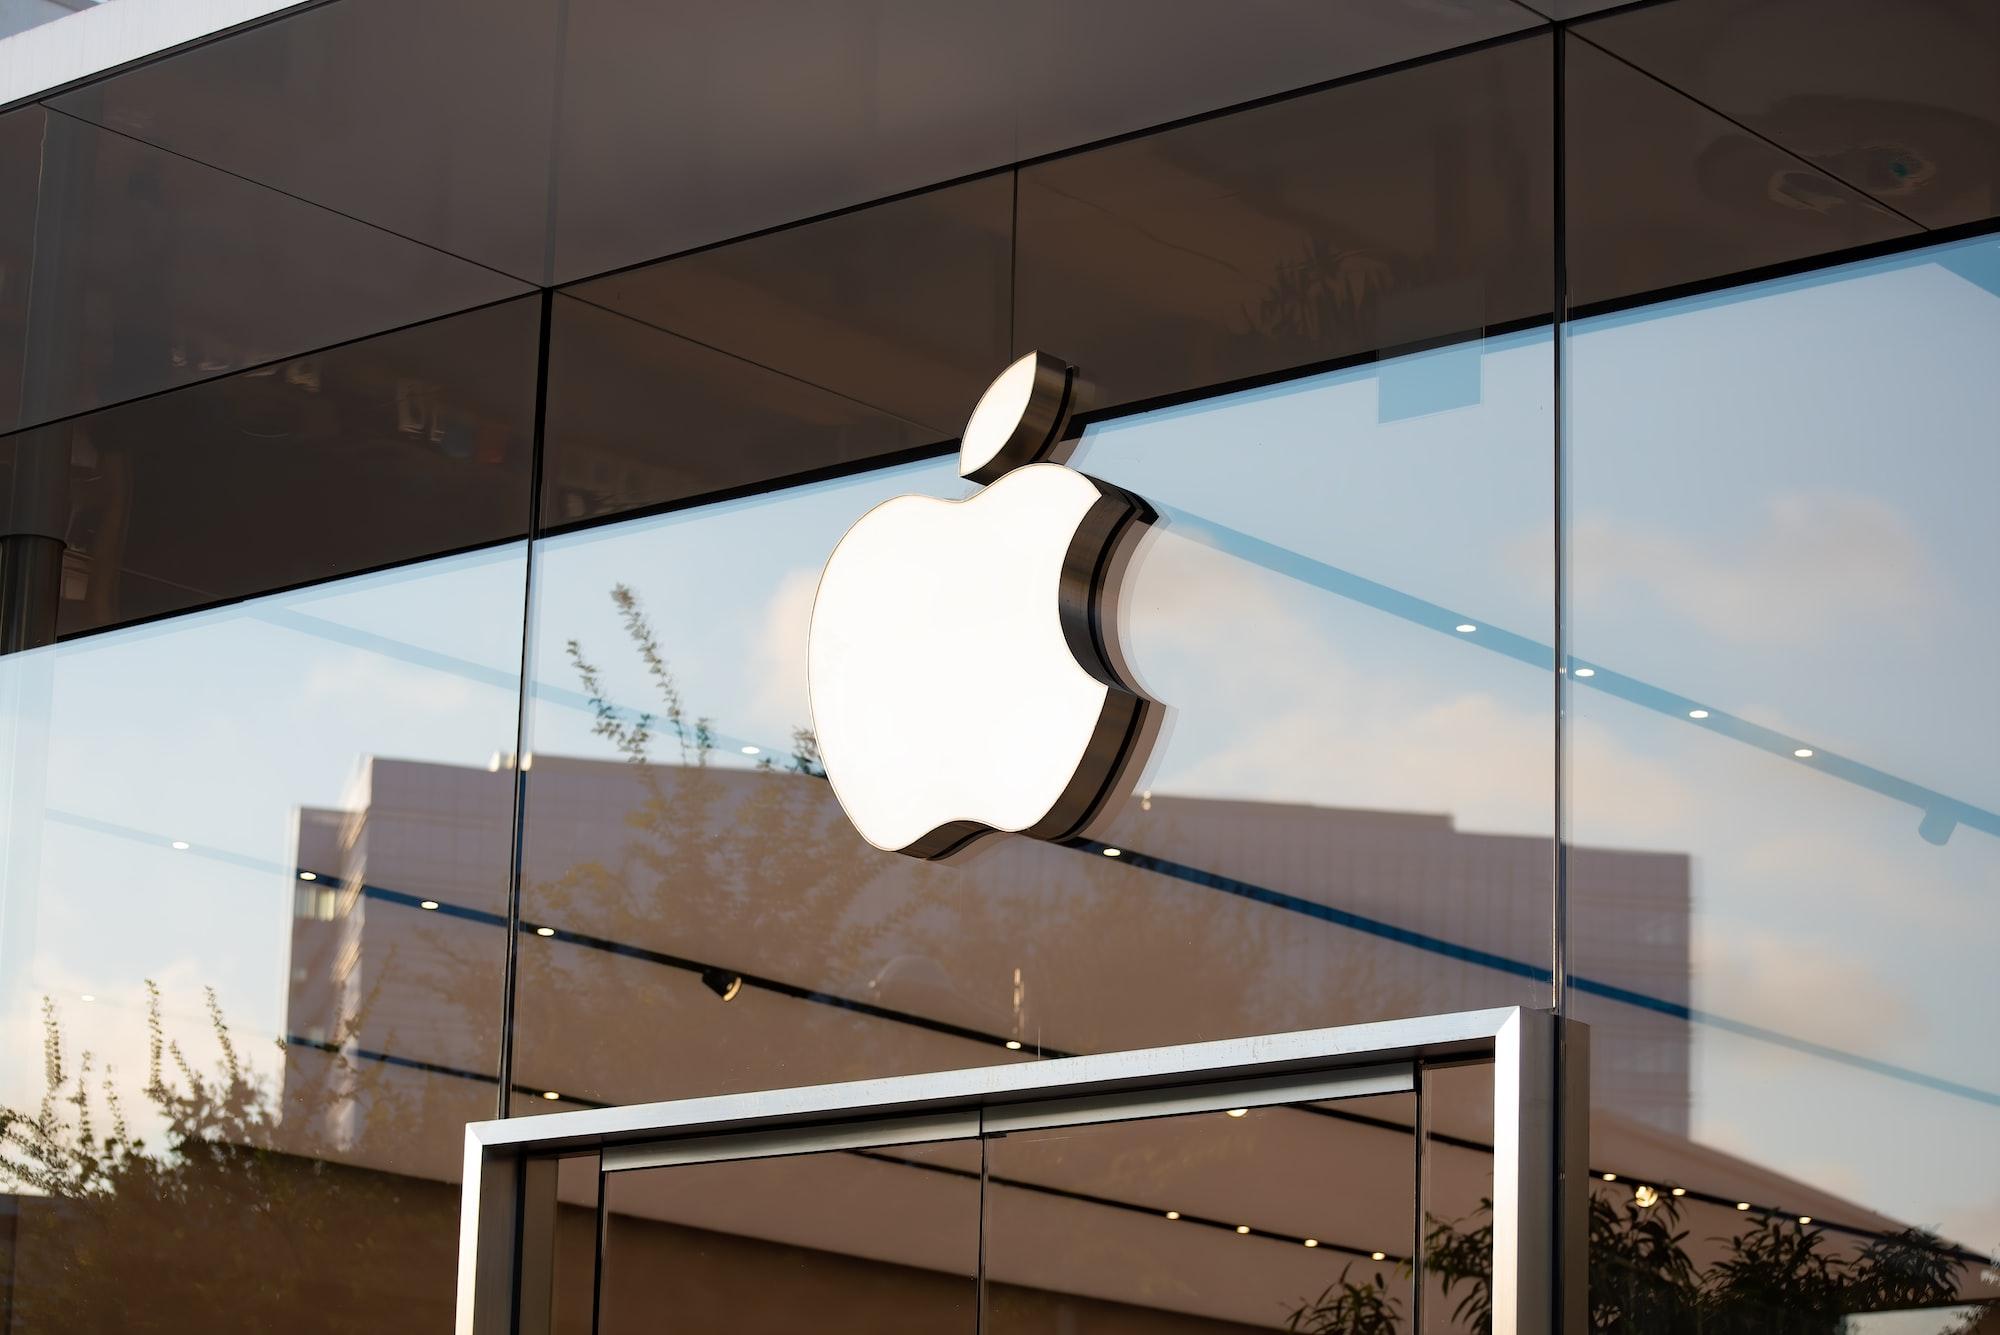 Germany starts antitrust investigation against Apple